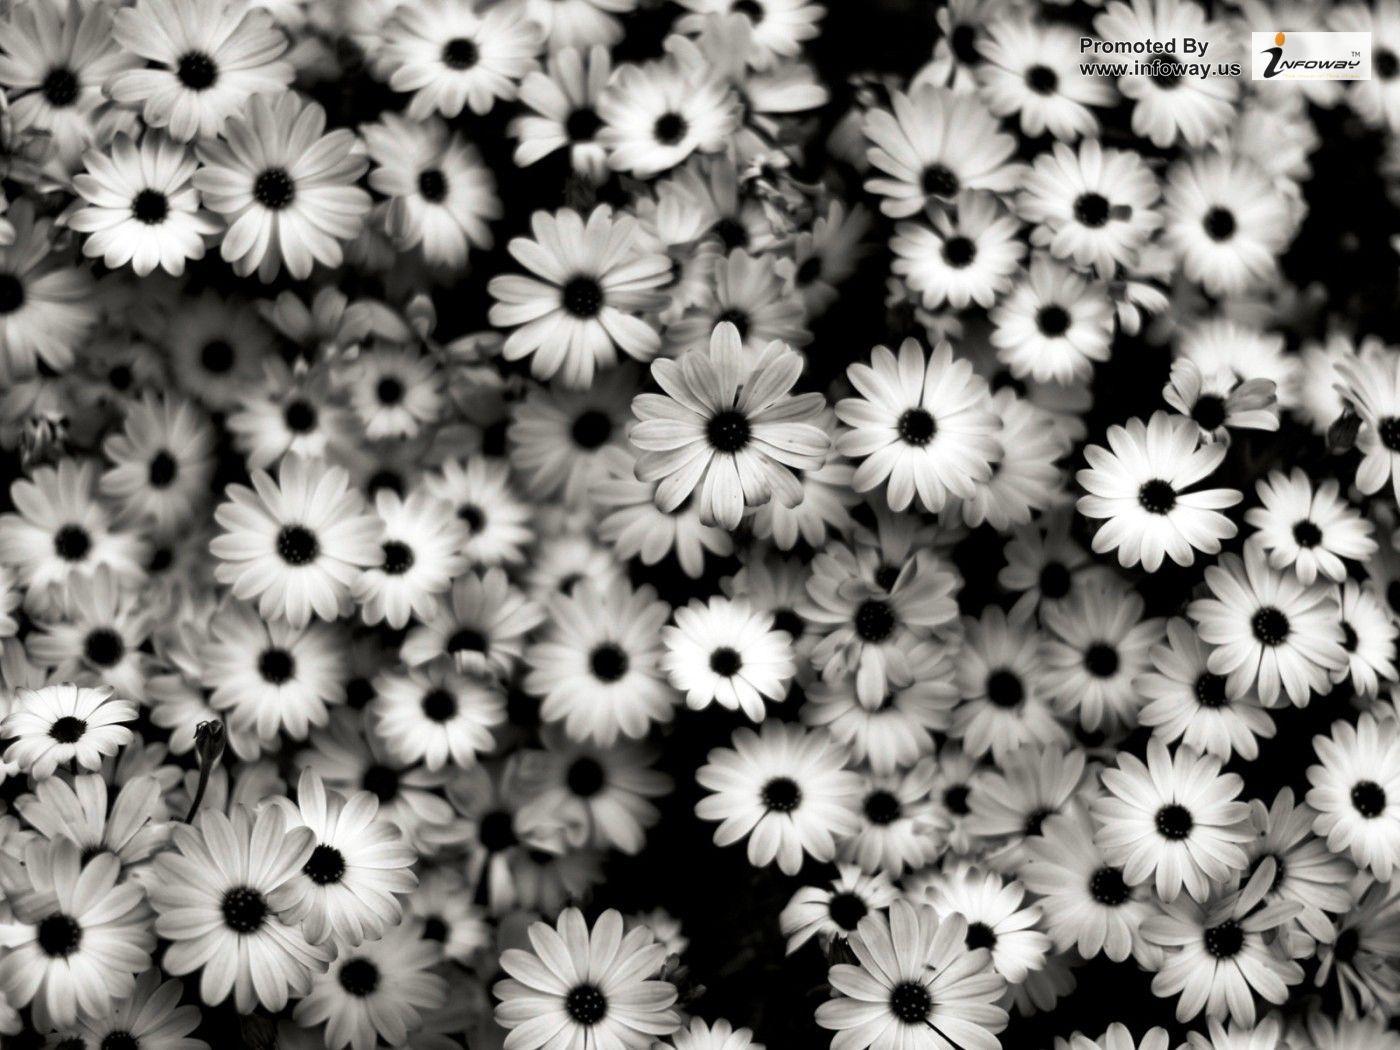 Daisy Flower Tumblr Wallpapers Desktop Background In 2020 Black And White Flowers Daisy Wallpaper White Flower Wallpaper